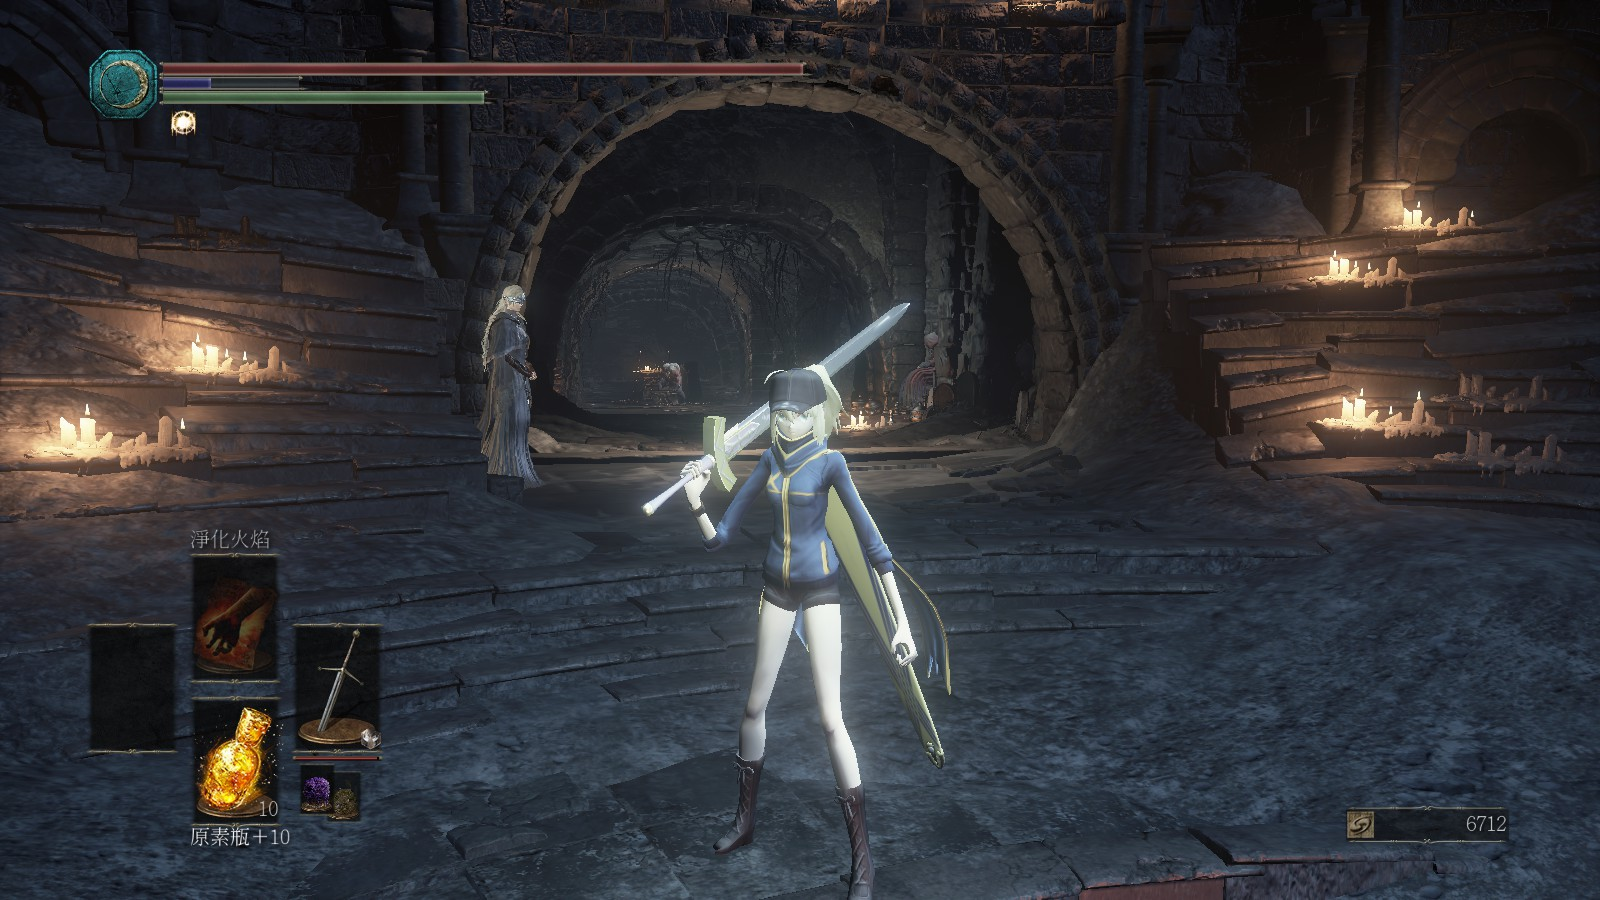 Mysterious Heroine X Mod Pack - Dark Souls III Mods